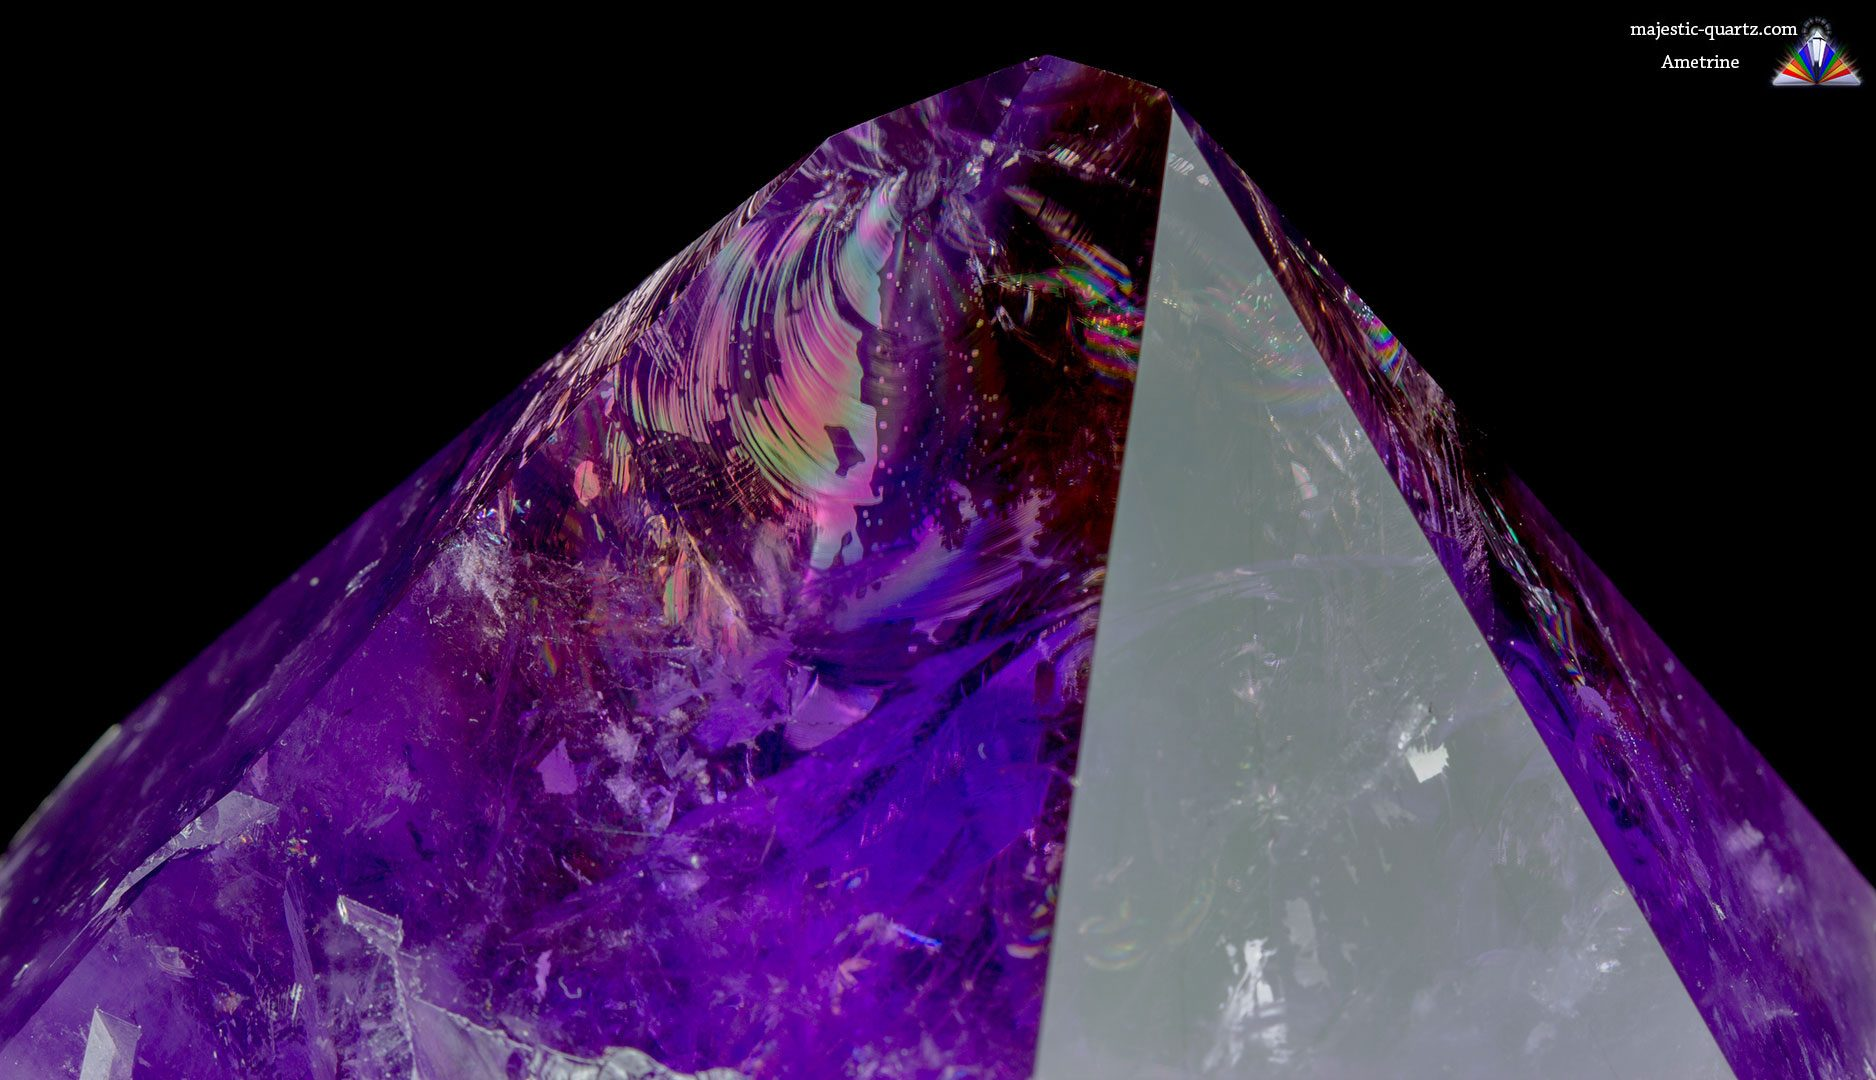 Ametrine Crystal - Photograph by Anthony Bradford